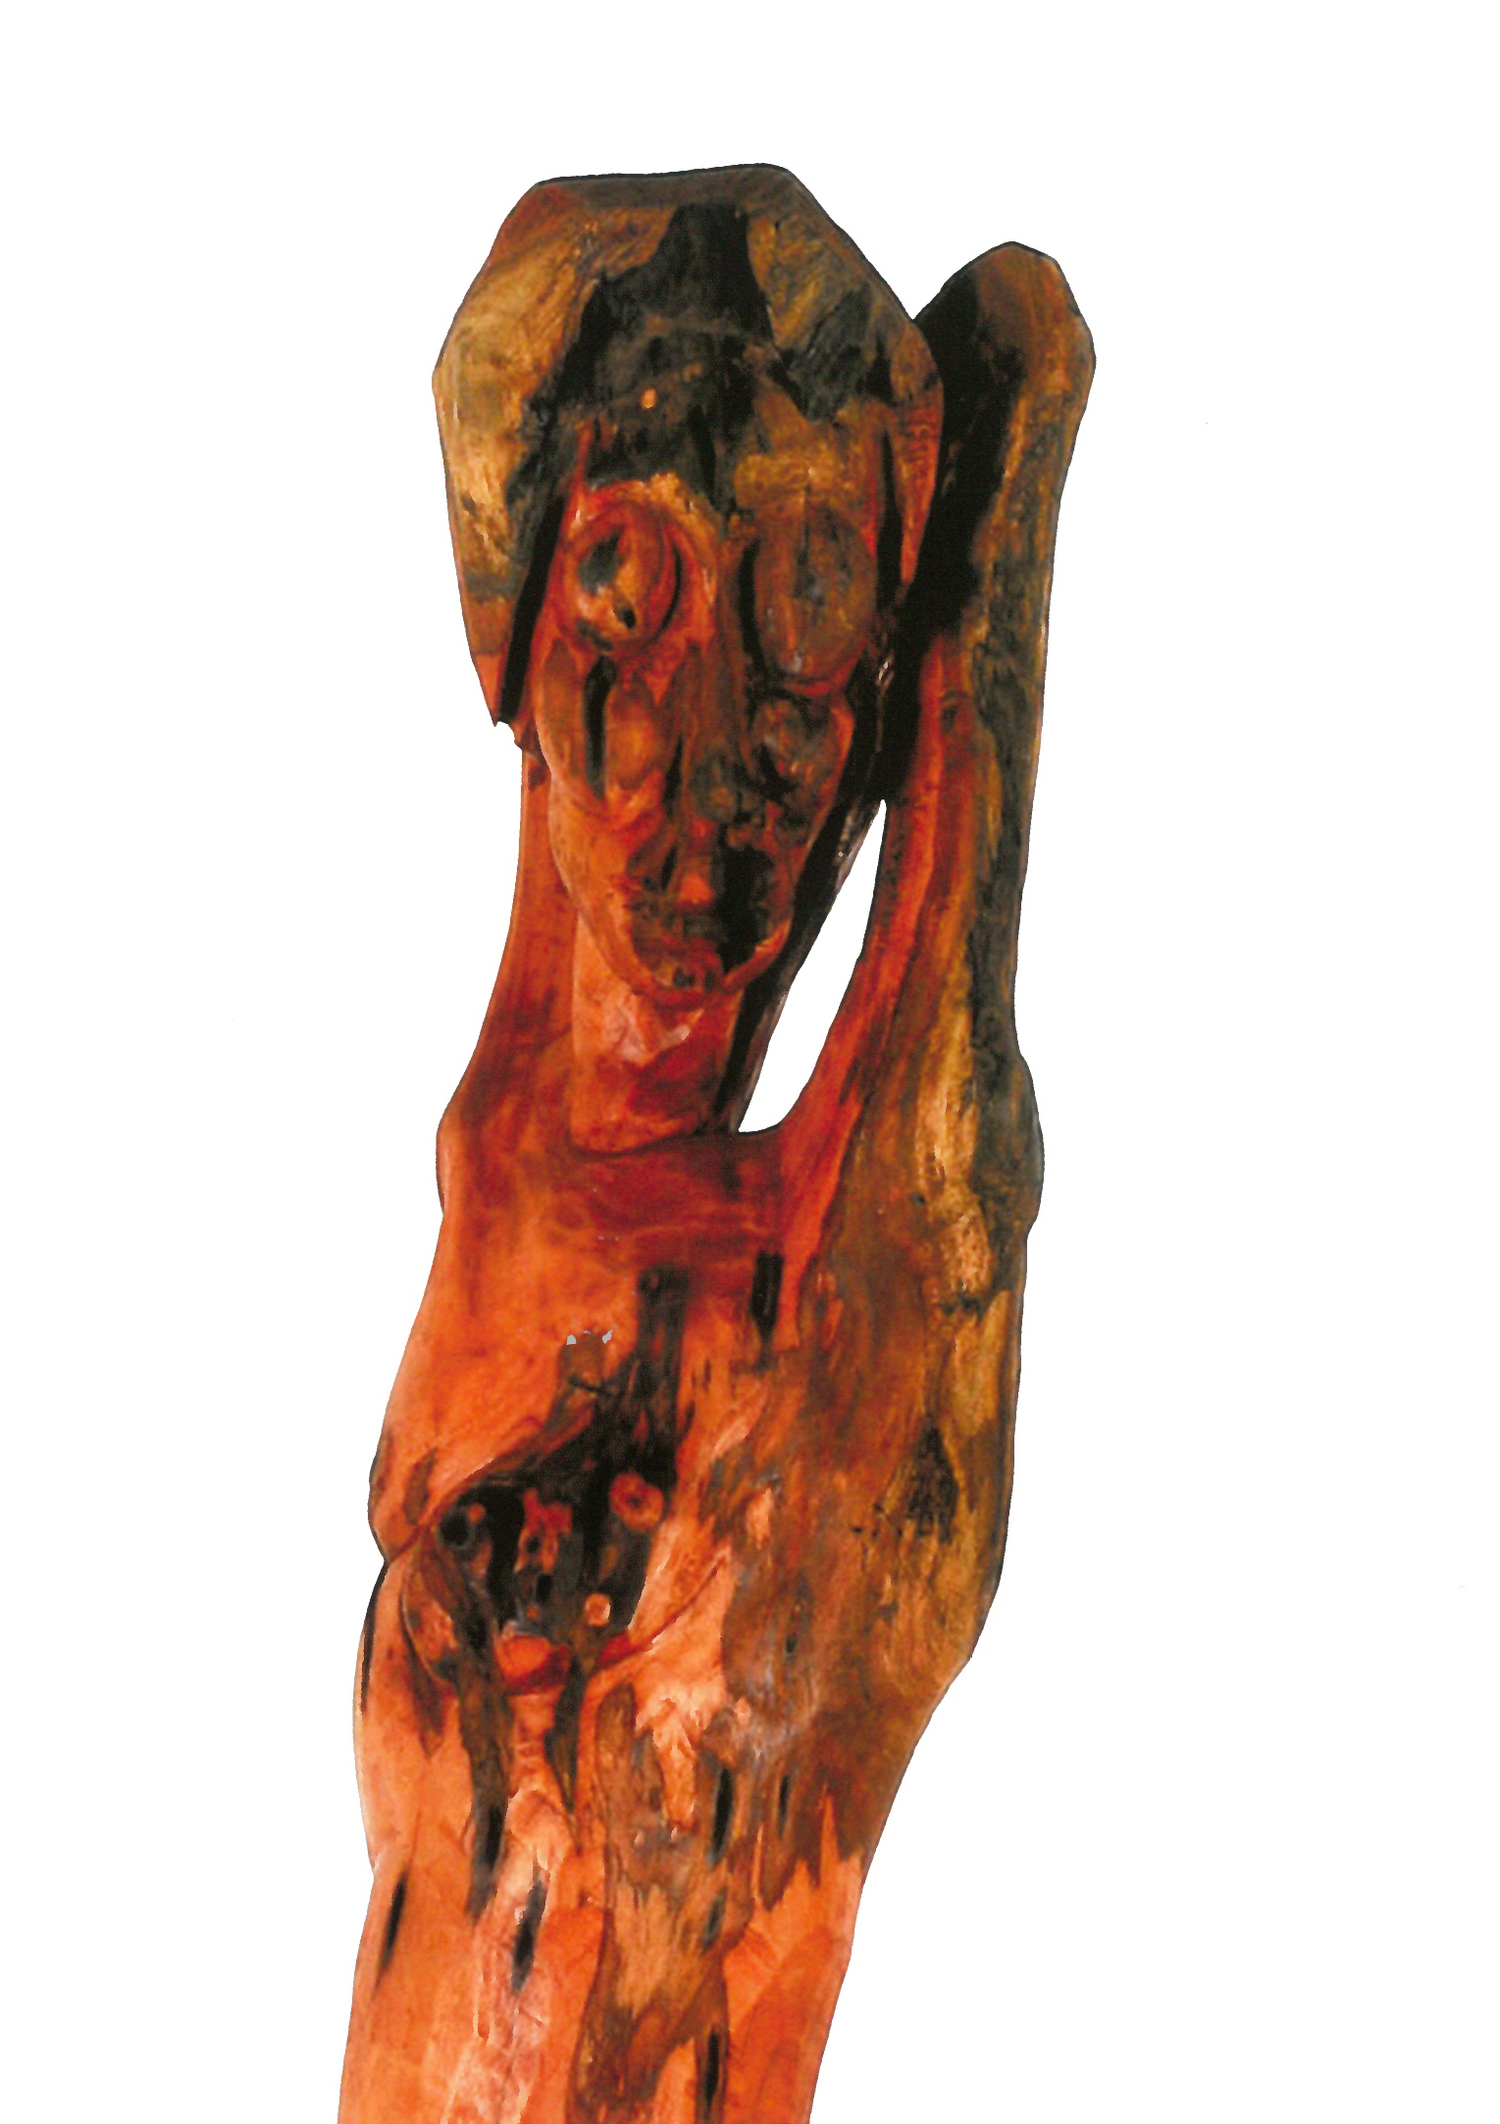 Antonius+Roberts_La+Femme+de+Lyford+Cay+(detail)_2006_Recycled+Madeira_72%22.jpg